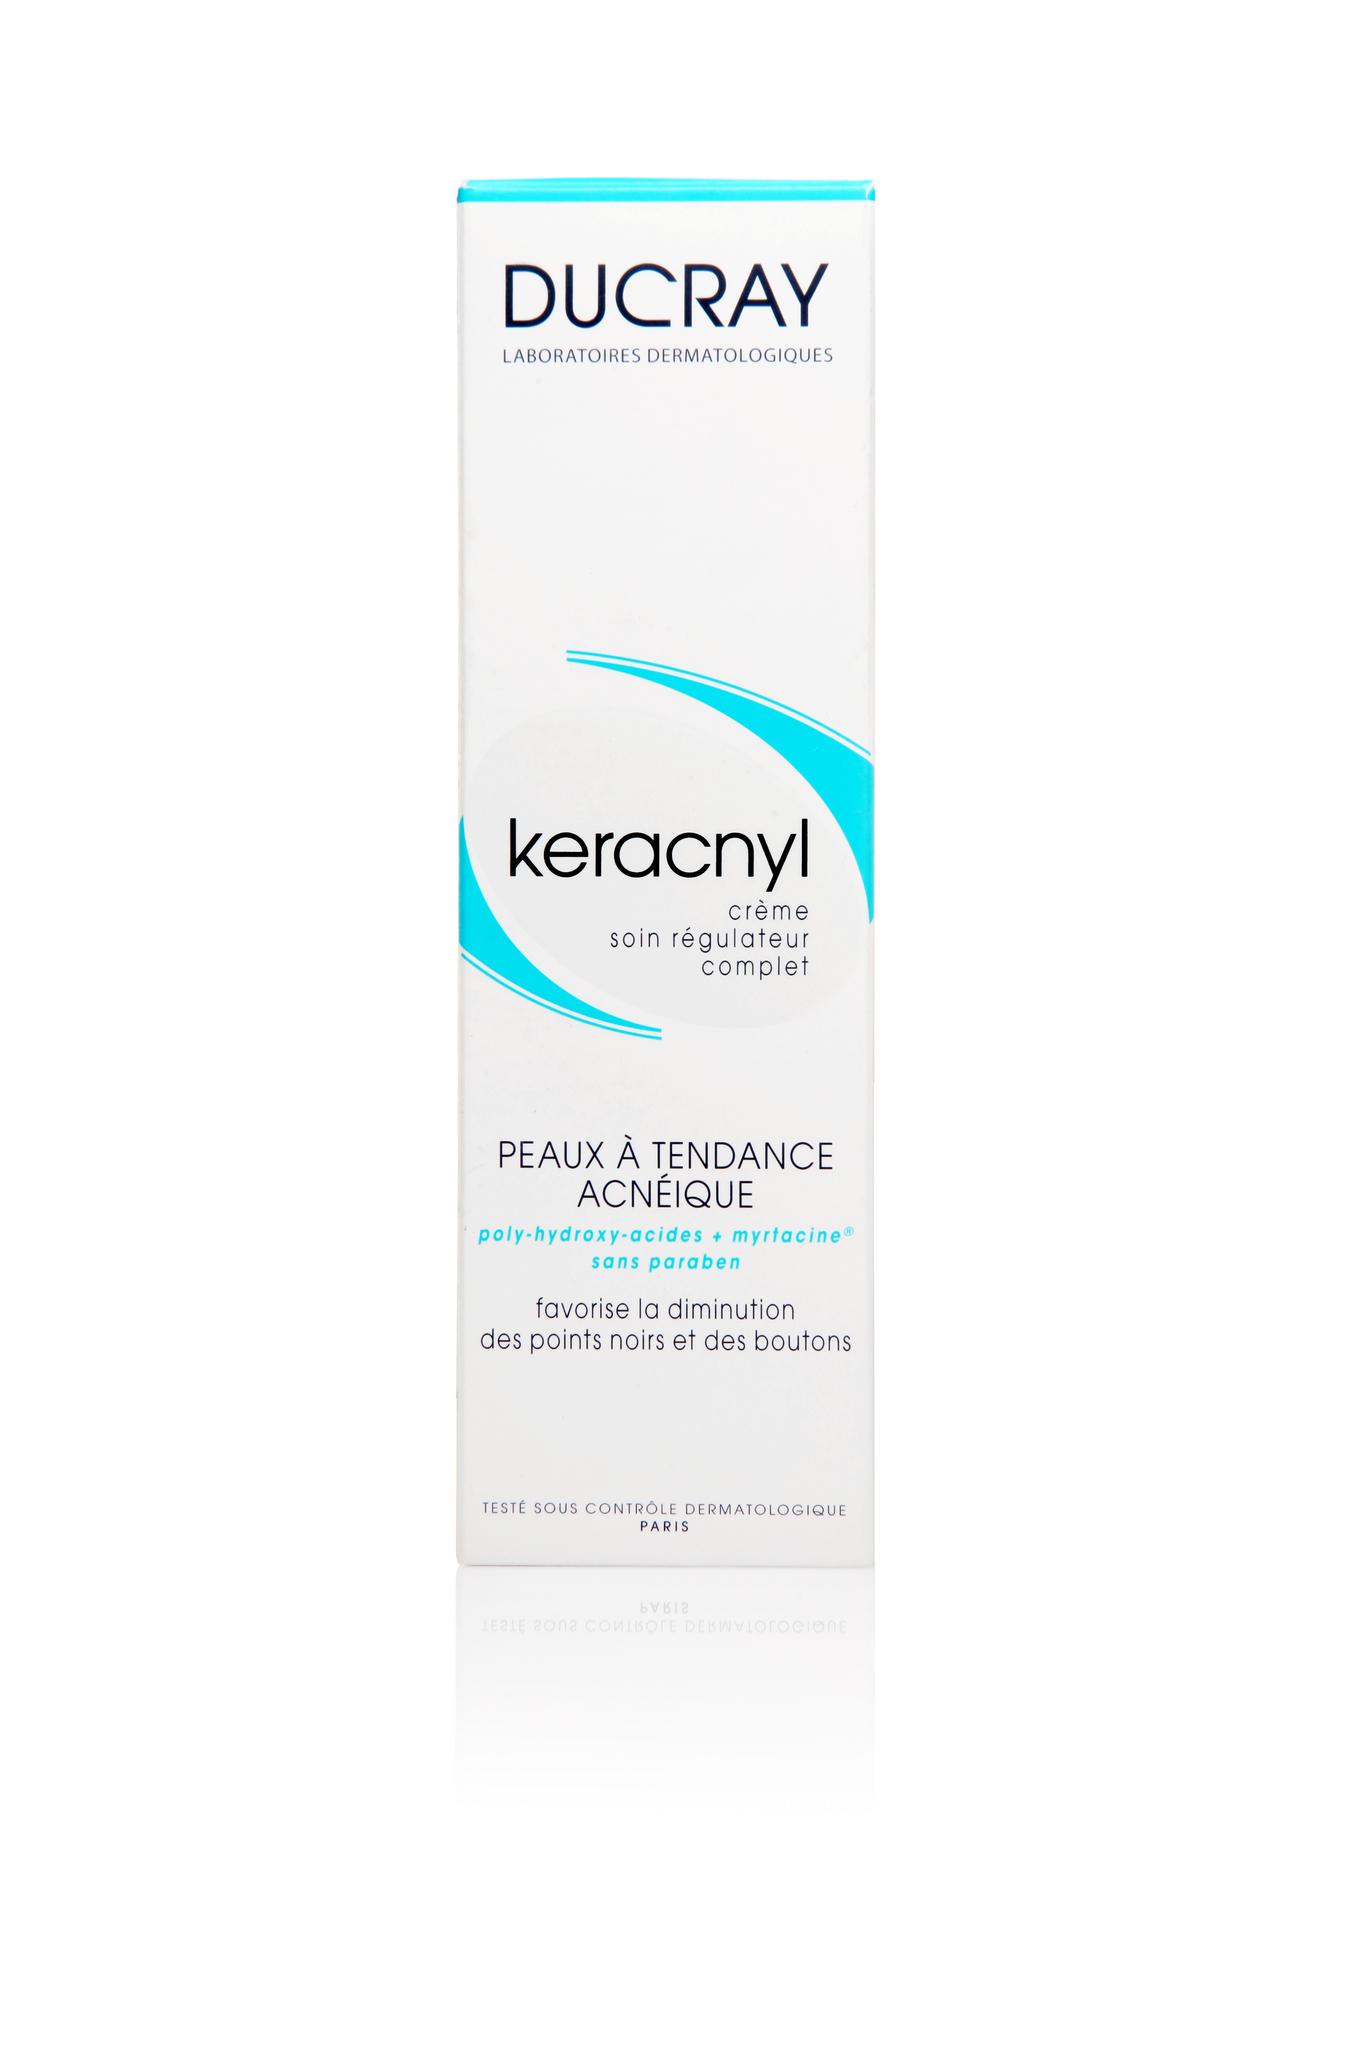 Ducray Keracnyl регулирующий крем для кожи с акне 30 мл.